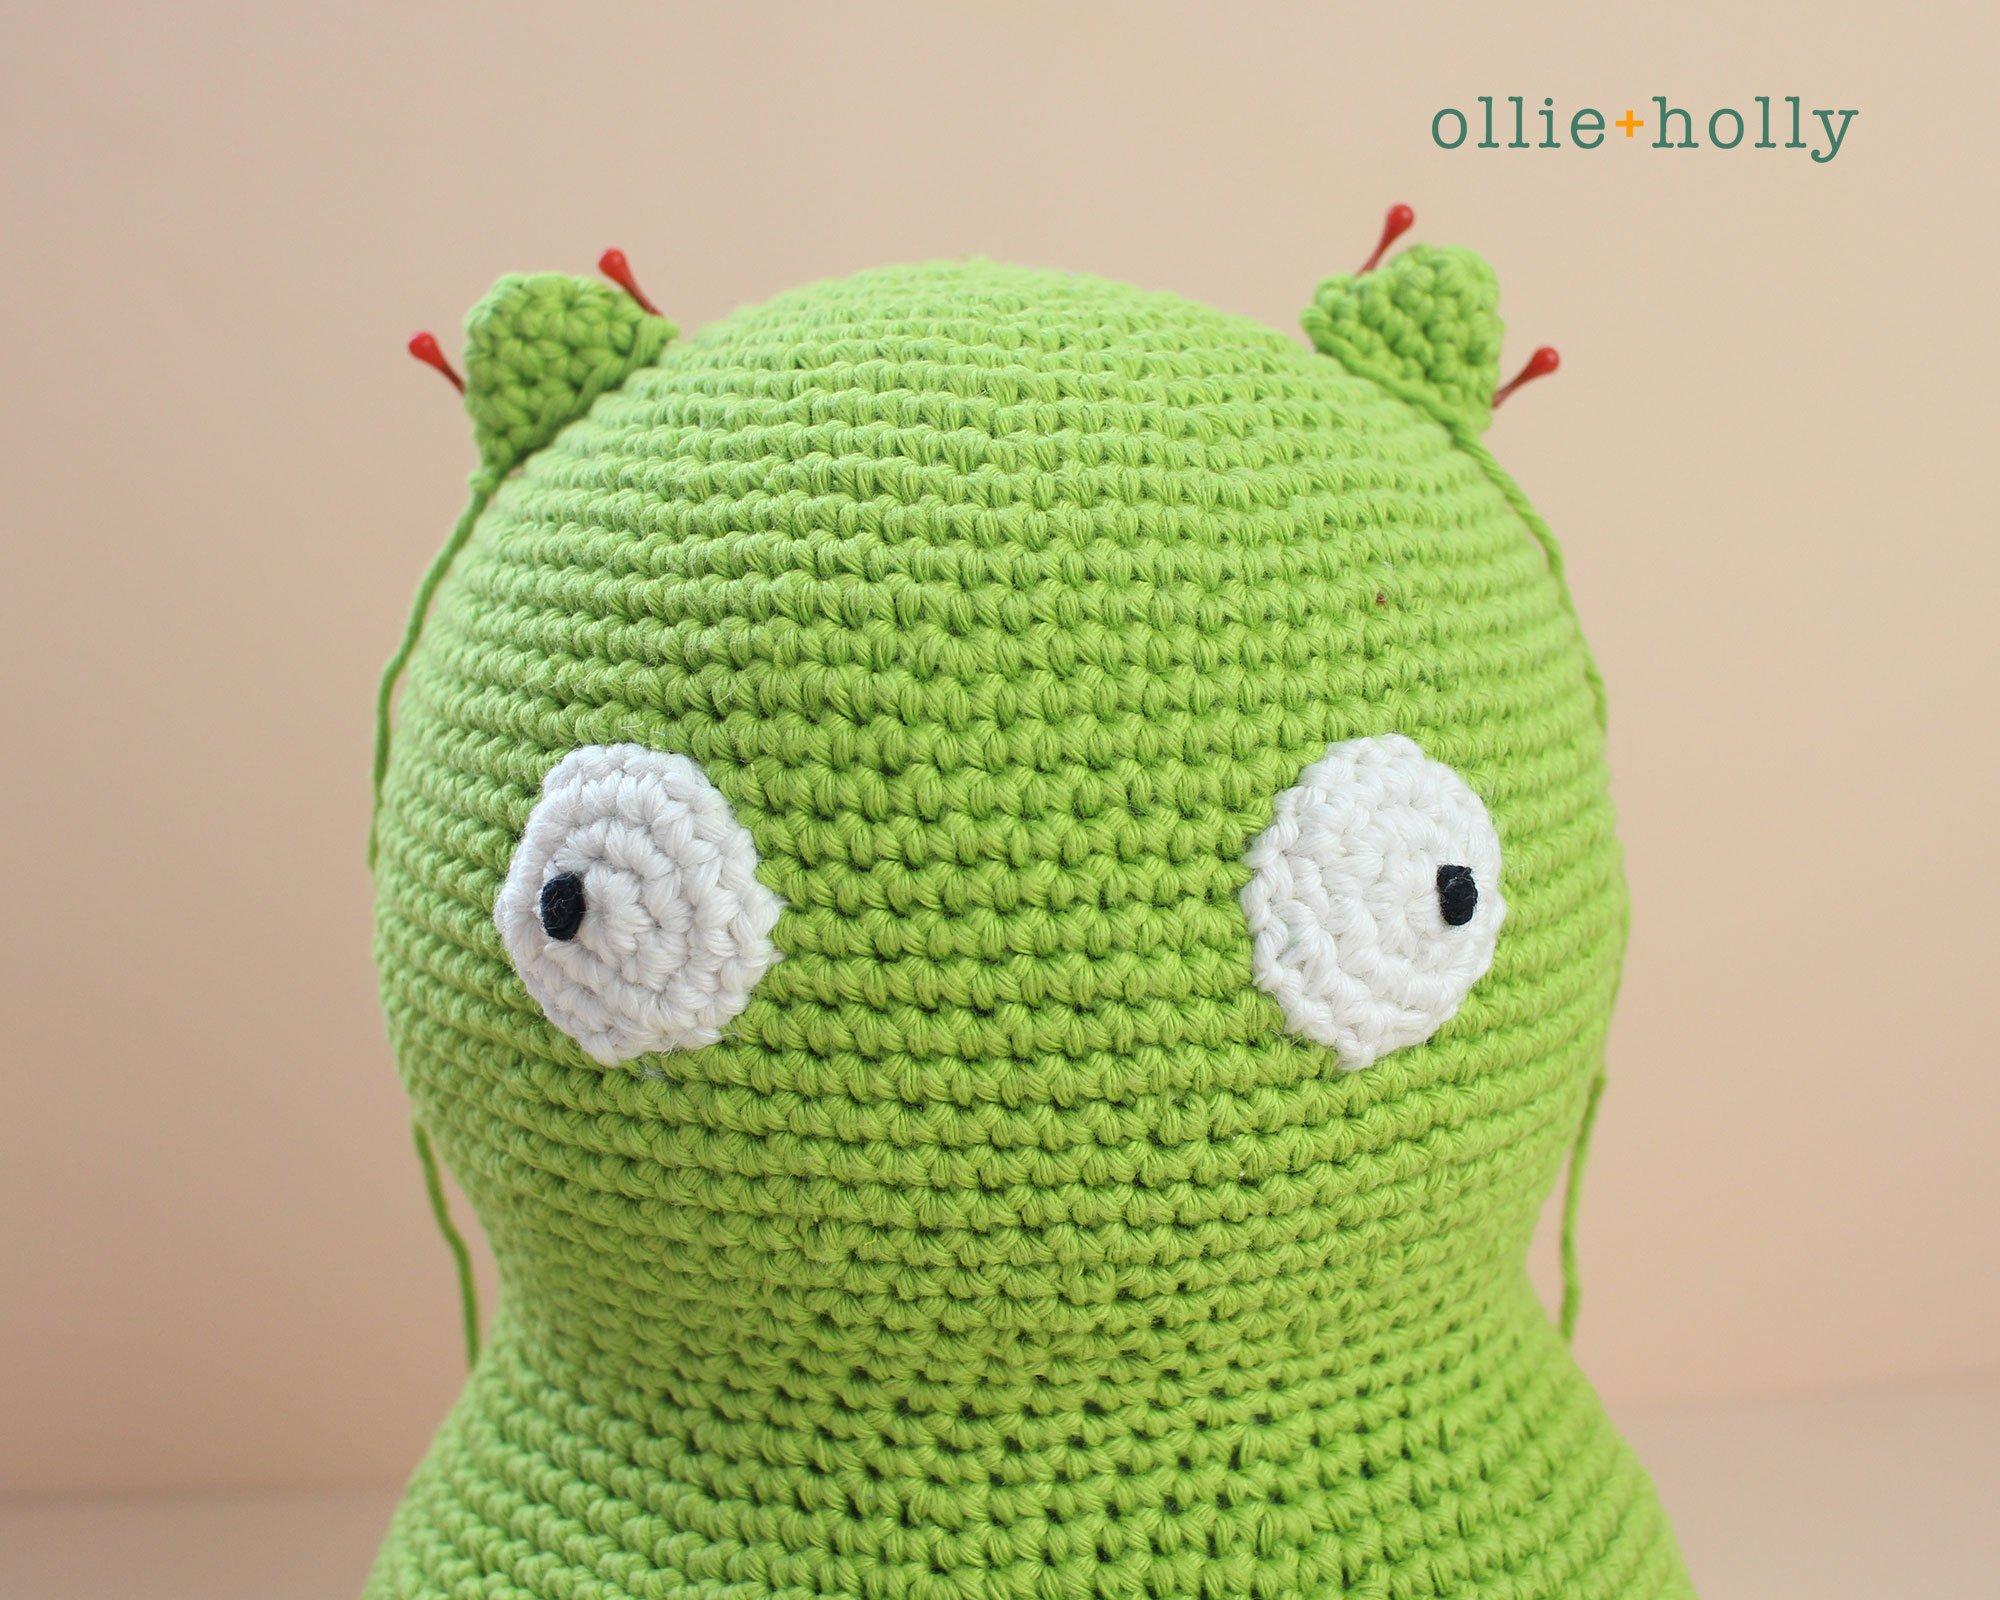 Free Louise Belcher's Stuffed Animal Kuchi Kopi (from Bob's Burgers) Amigurumi Crochet Pattern Step 8